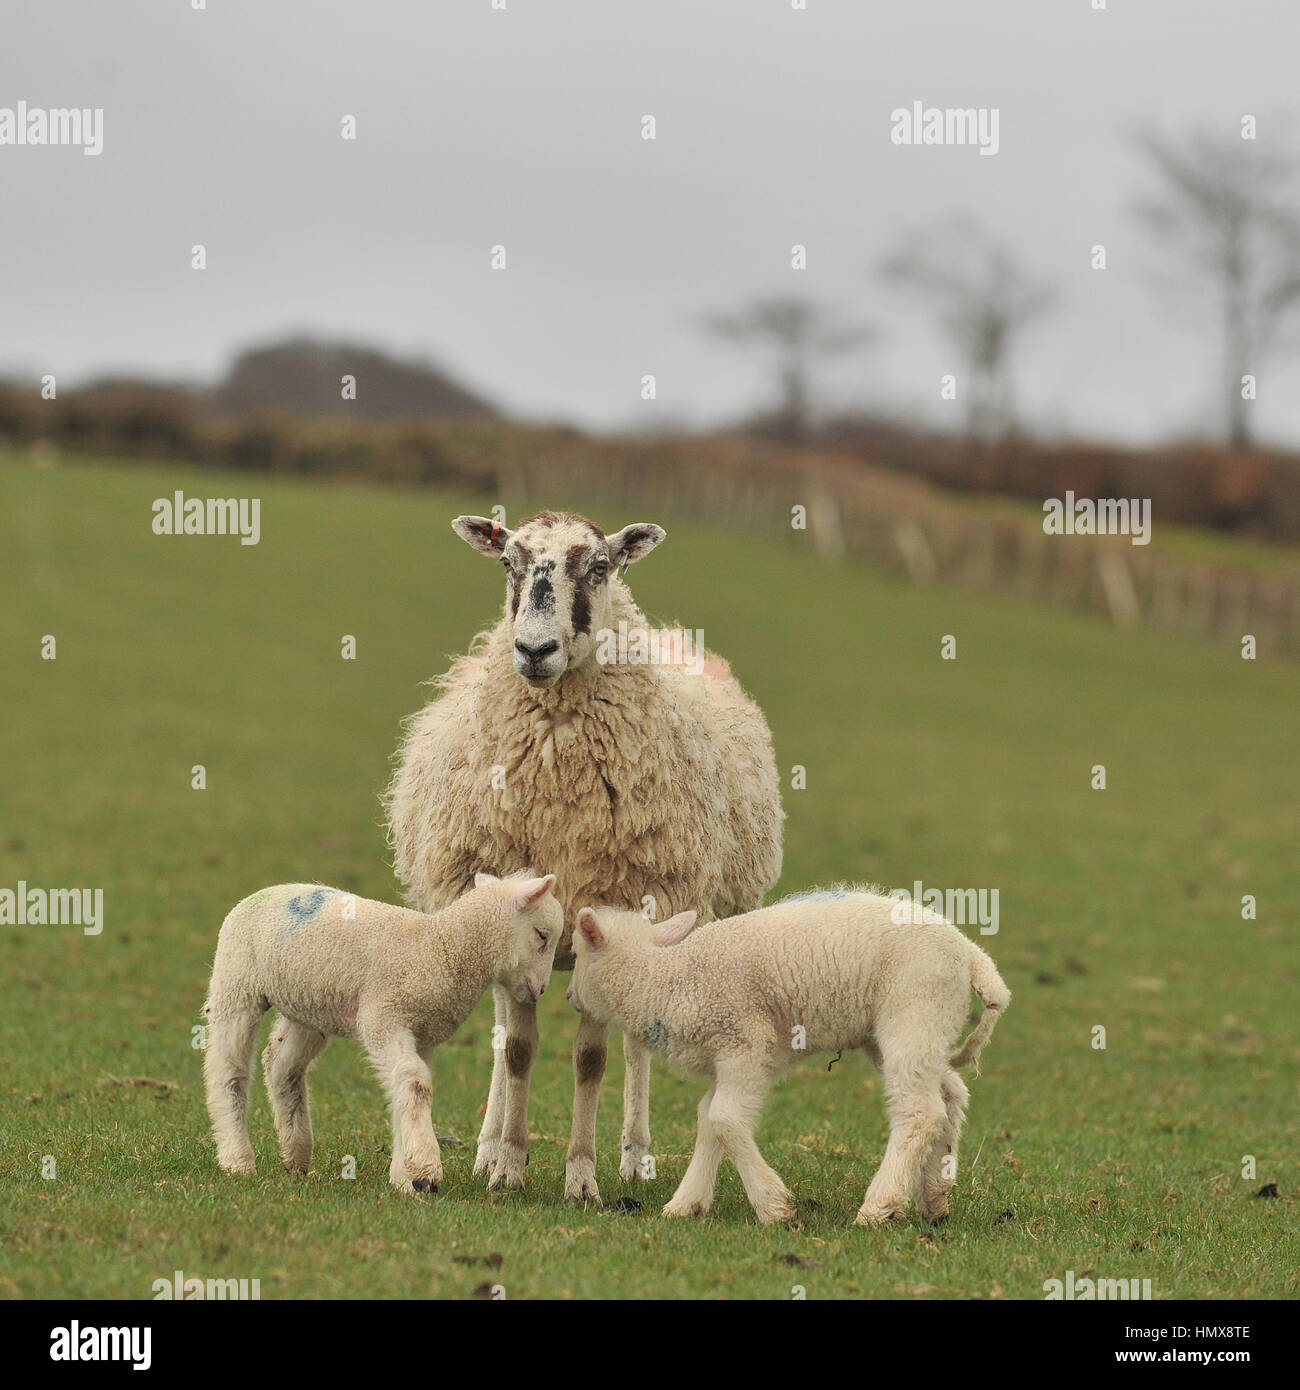 lamb in field - Stock Image